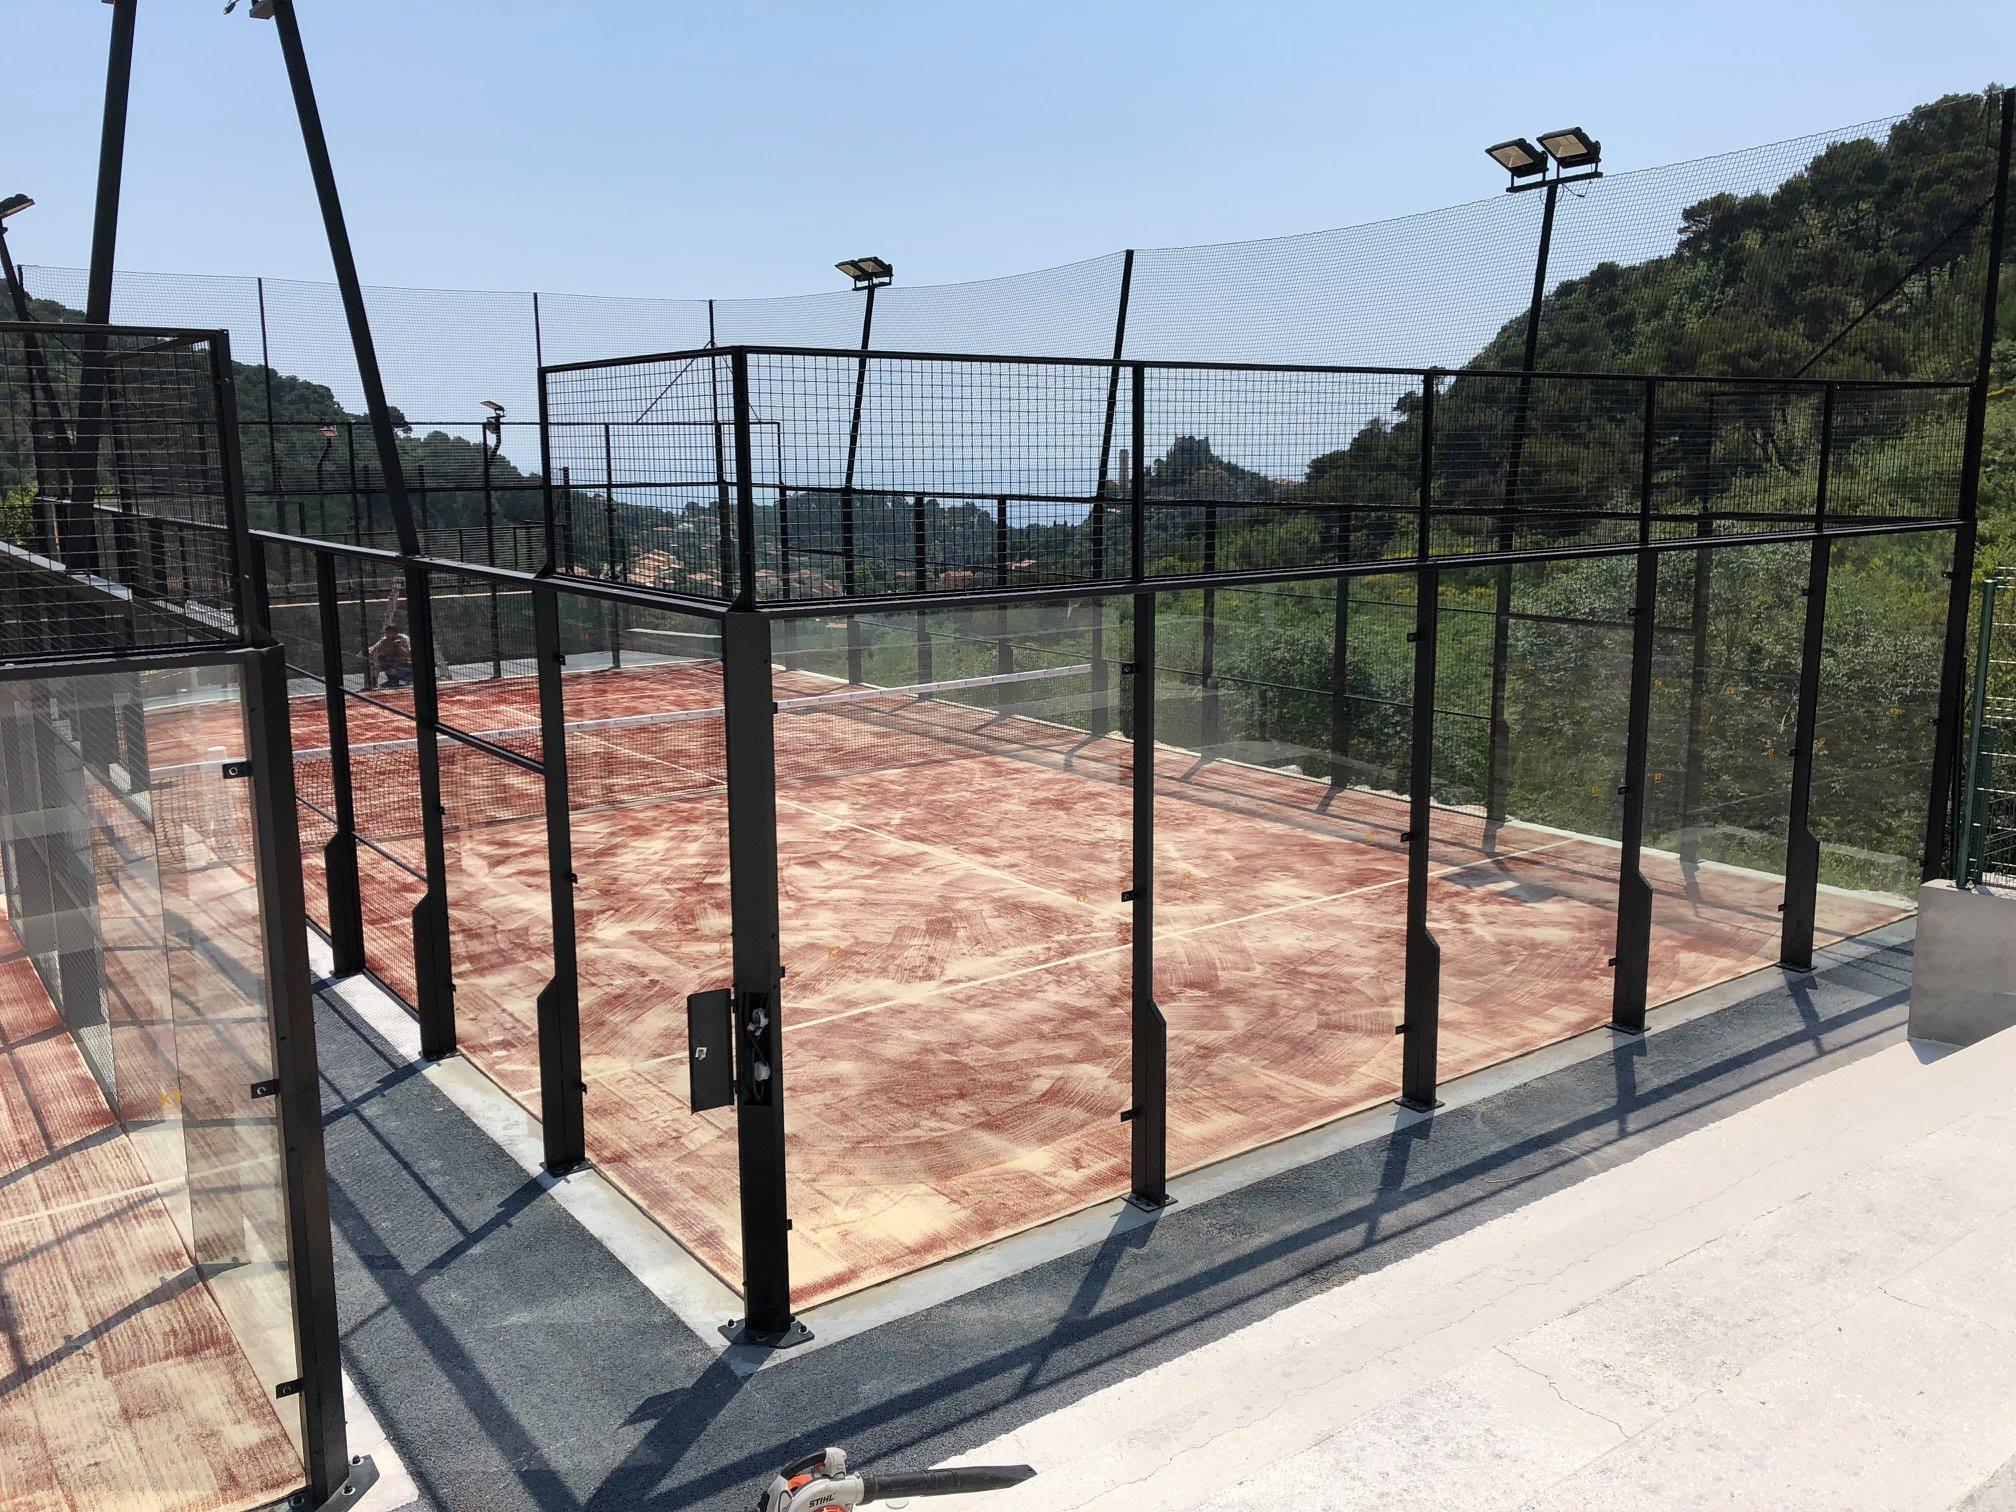 Le Padel Club Eze buduje 3 boiska padel w +